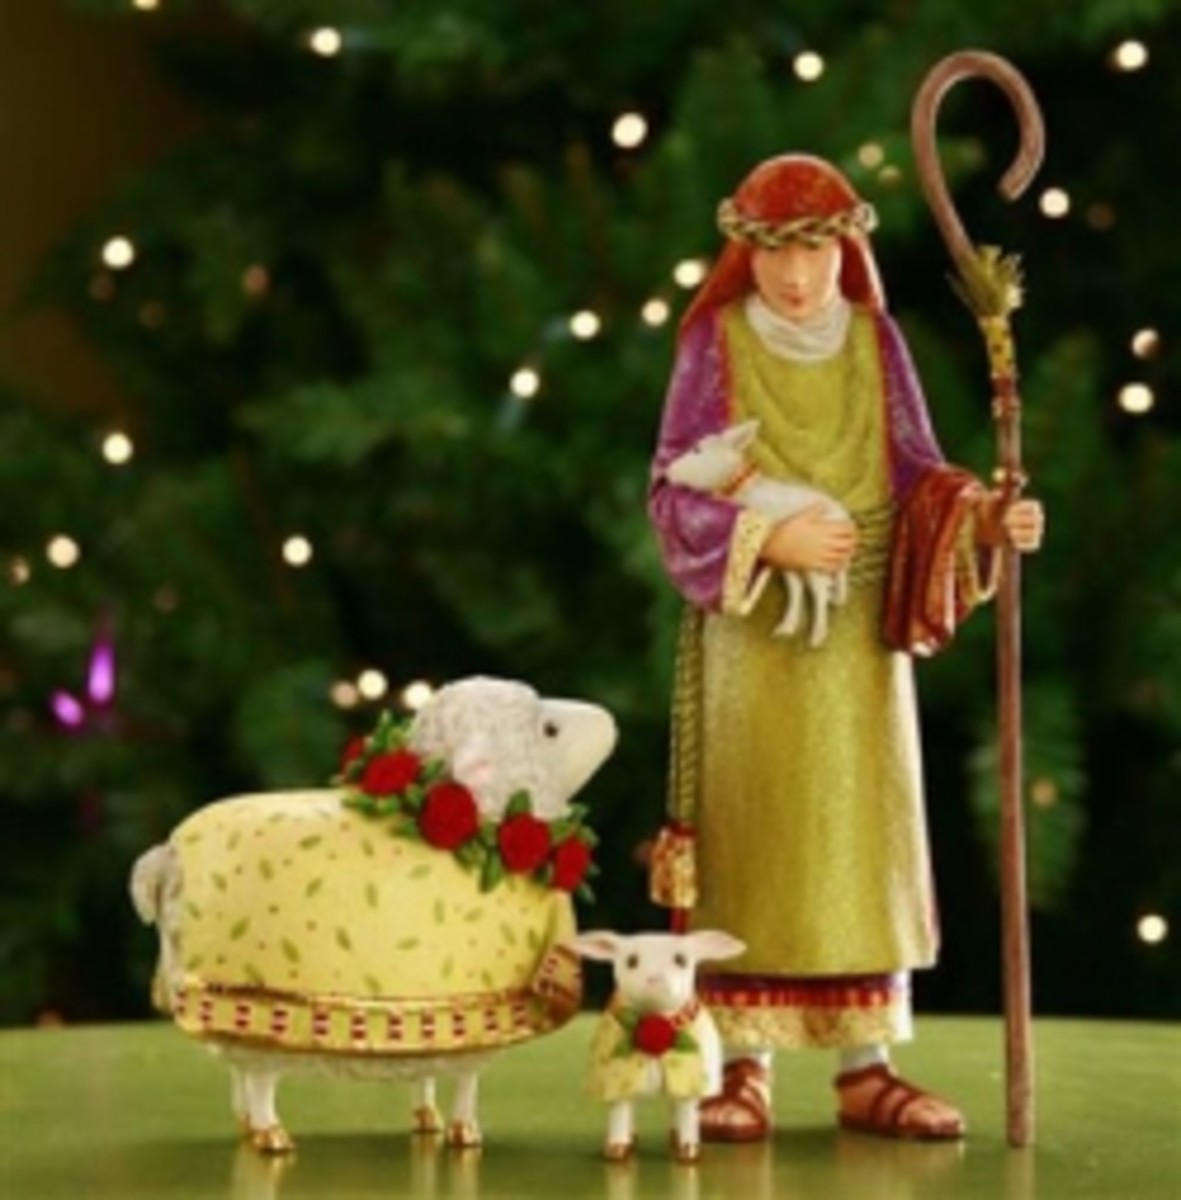 Patience Brewster Nativity Scene Figurines